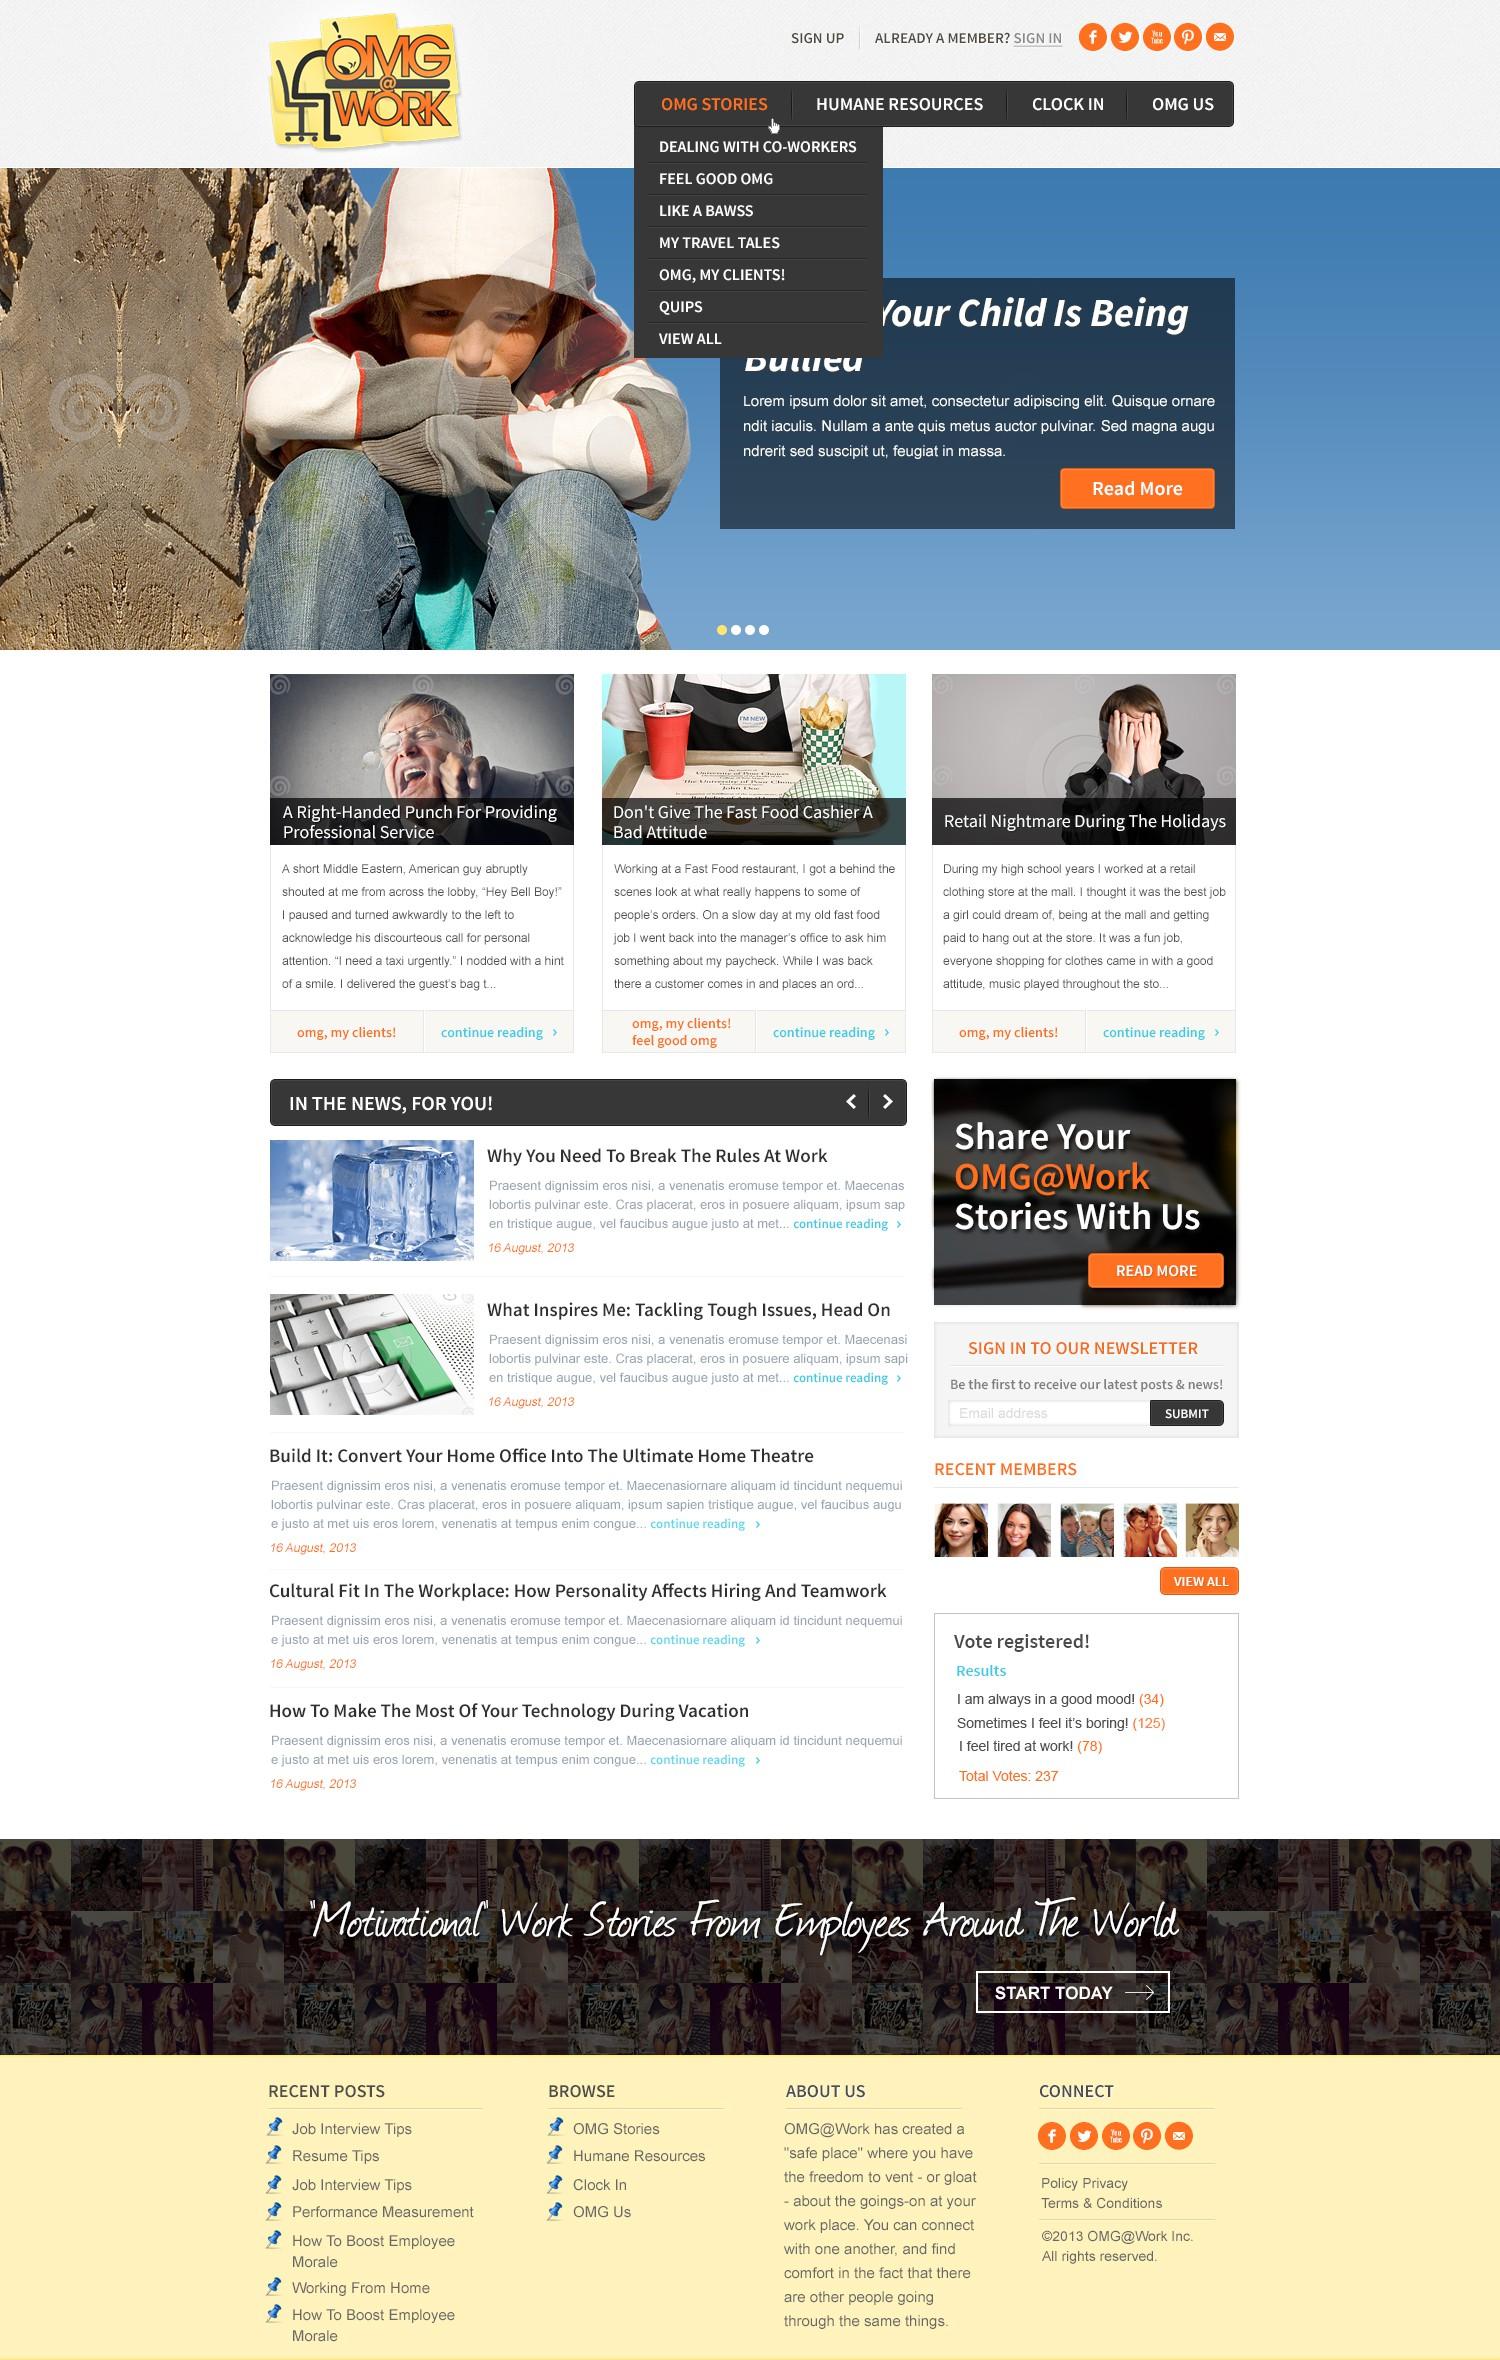 OMG at Work needs a new website design